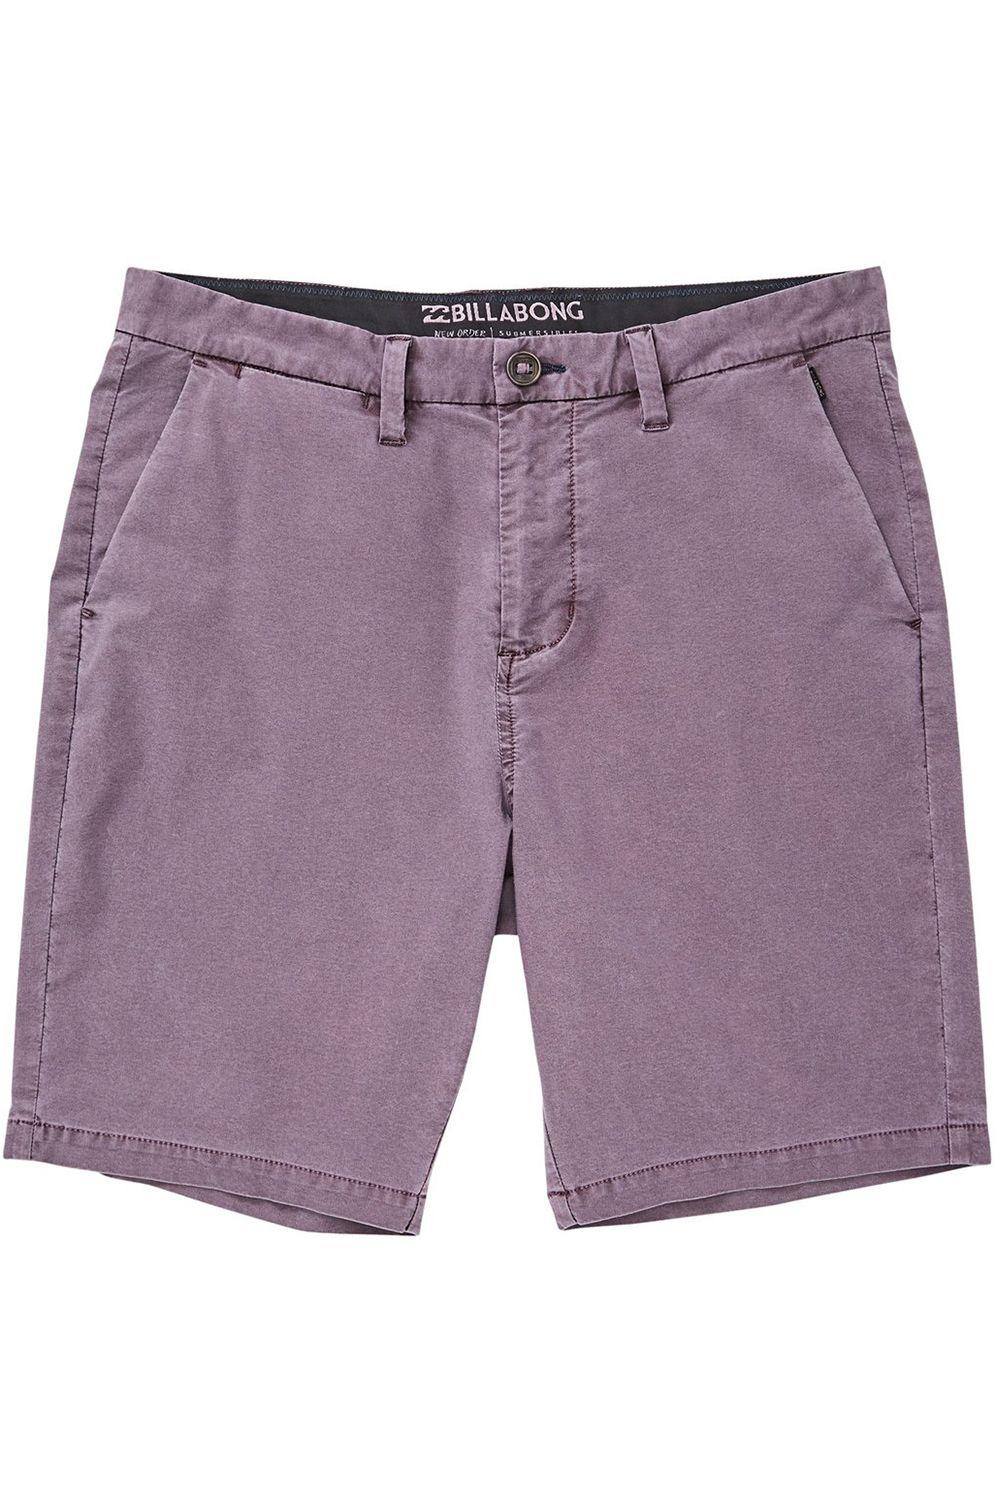 Billabong Walkshorts NEW ORDER X OVD Purple Haze